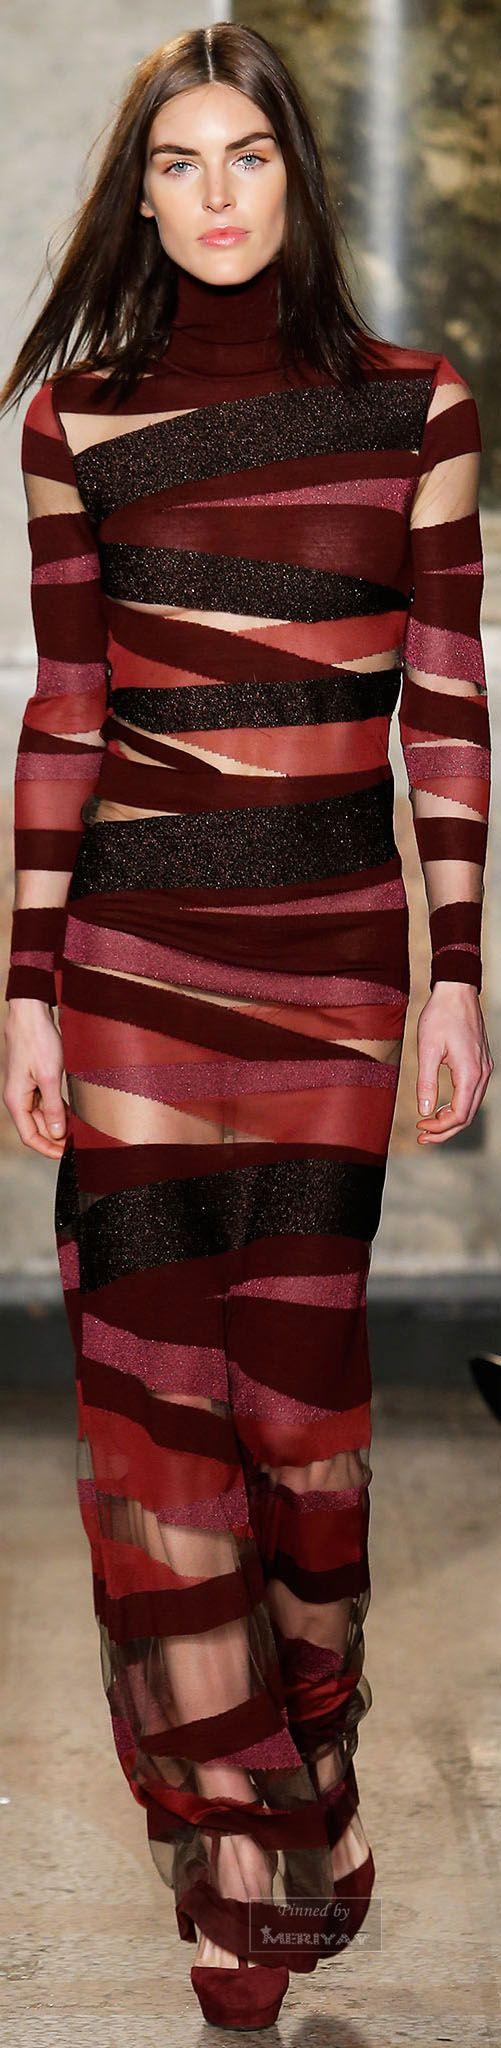 Emilio Pucci ~ Fall Sheer Bandage Maxi Dress, Burgundy+Black  2015.